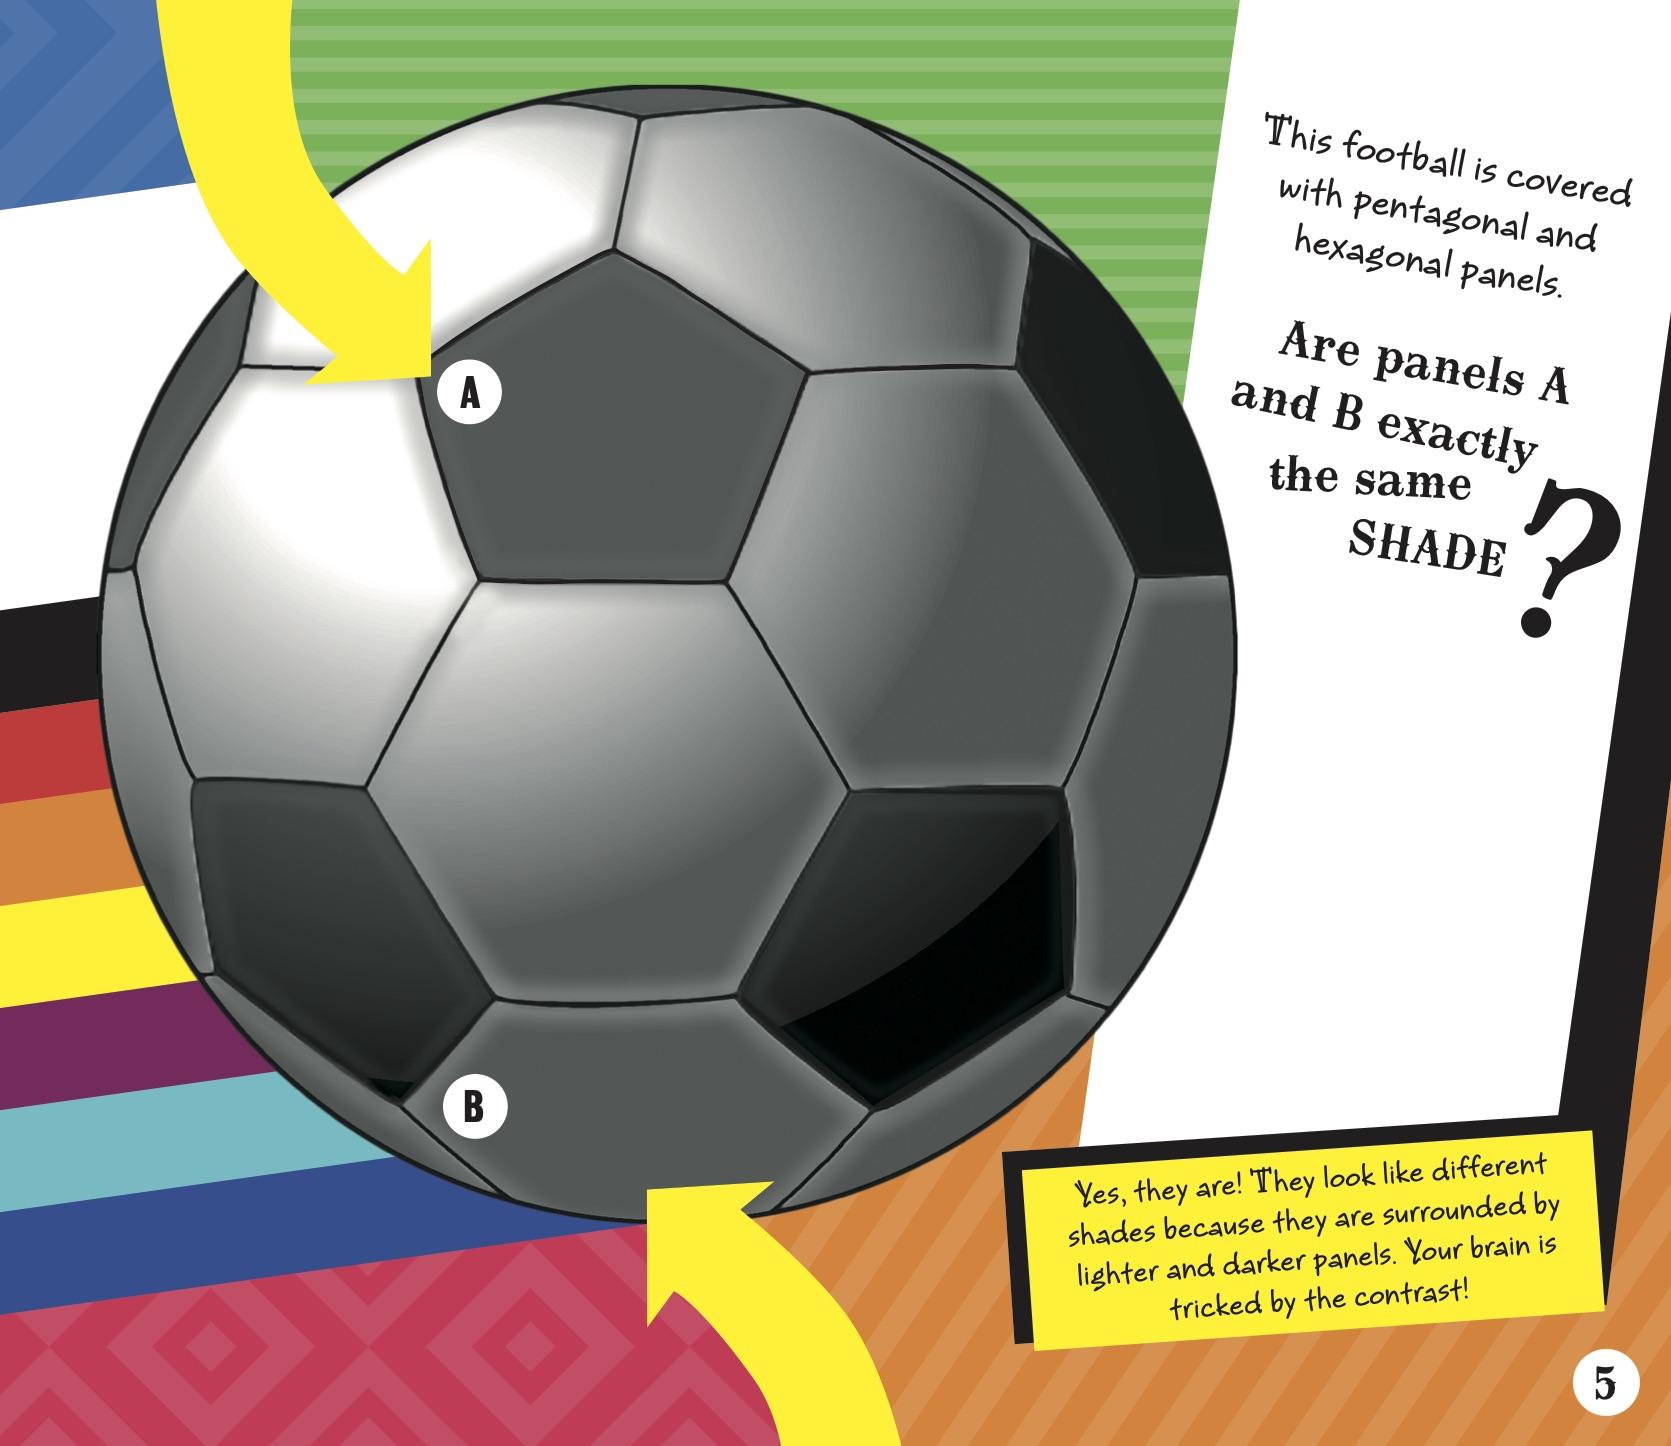 The Football